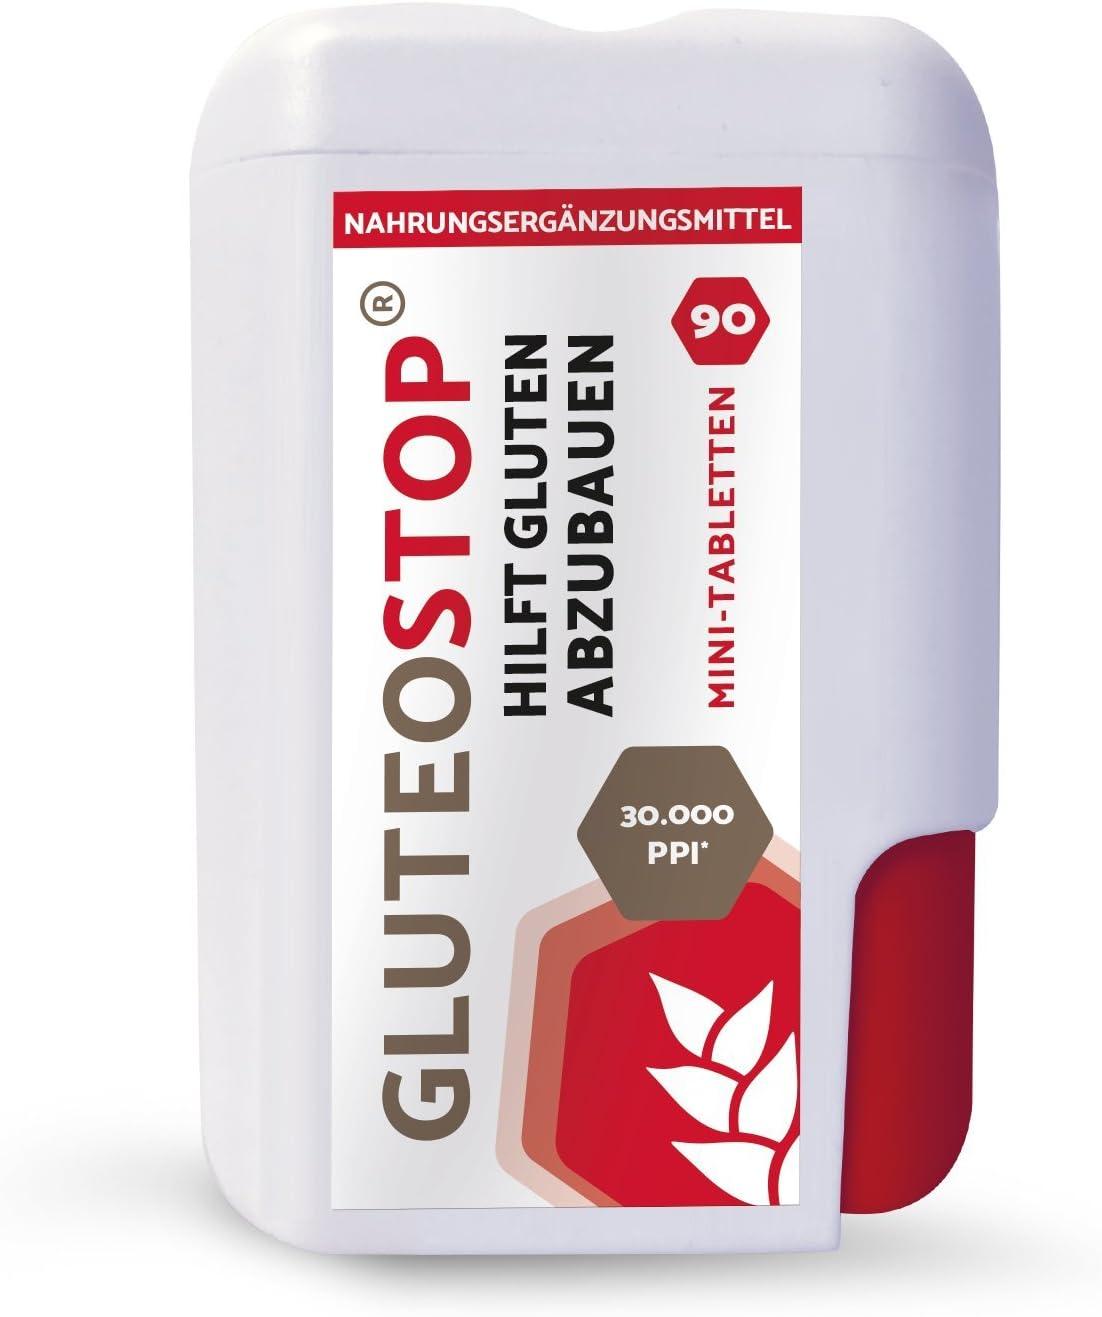 GluteoStop® - ayuda a descomponer el gluten - 90 mini tabletas - sensibilidad al gluten - dieta sin gluten - enzima gluten